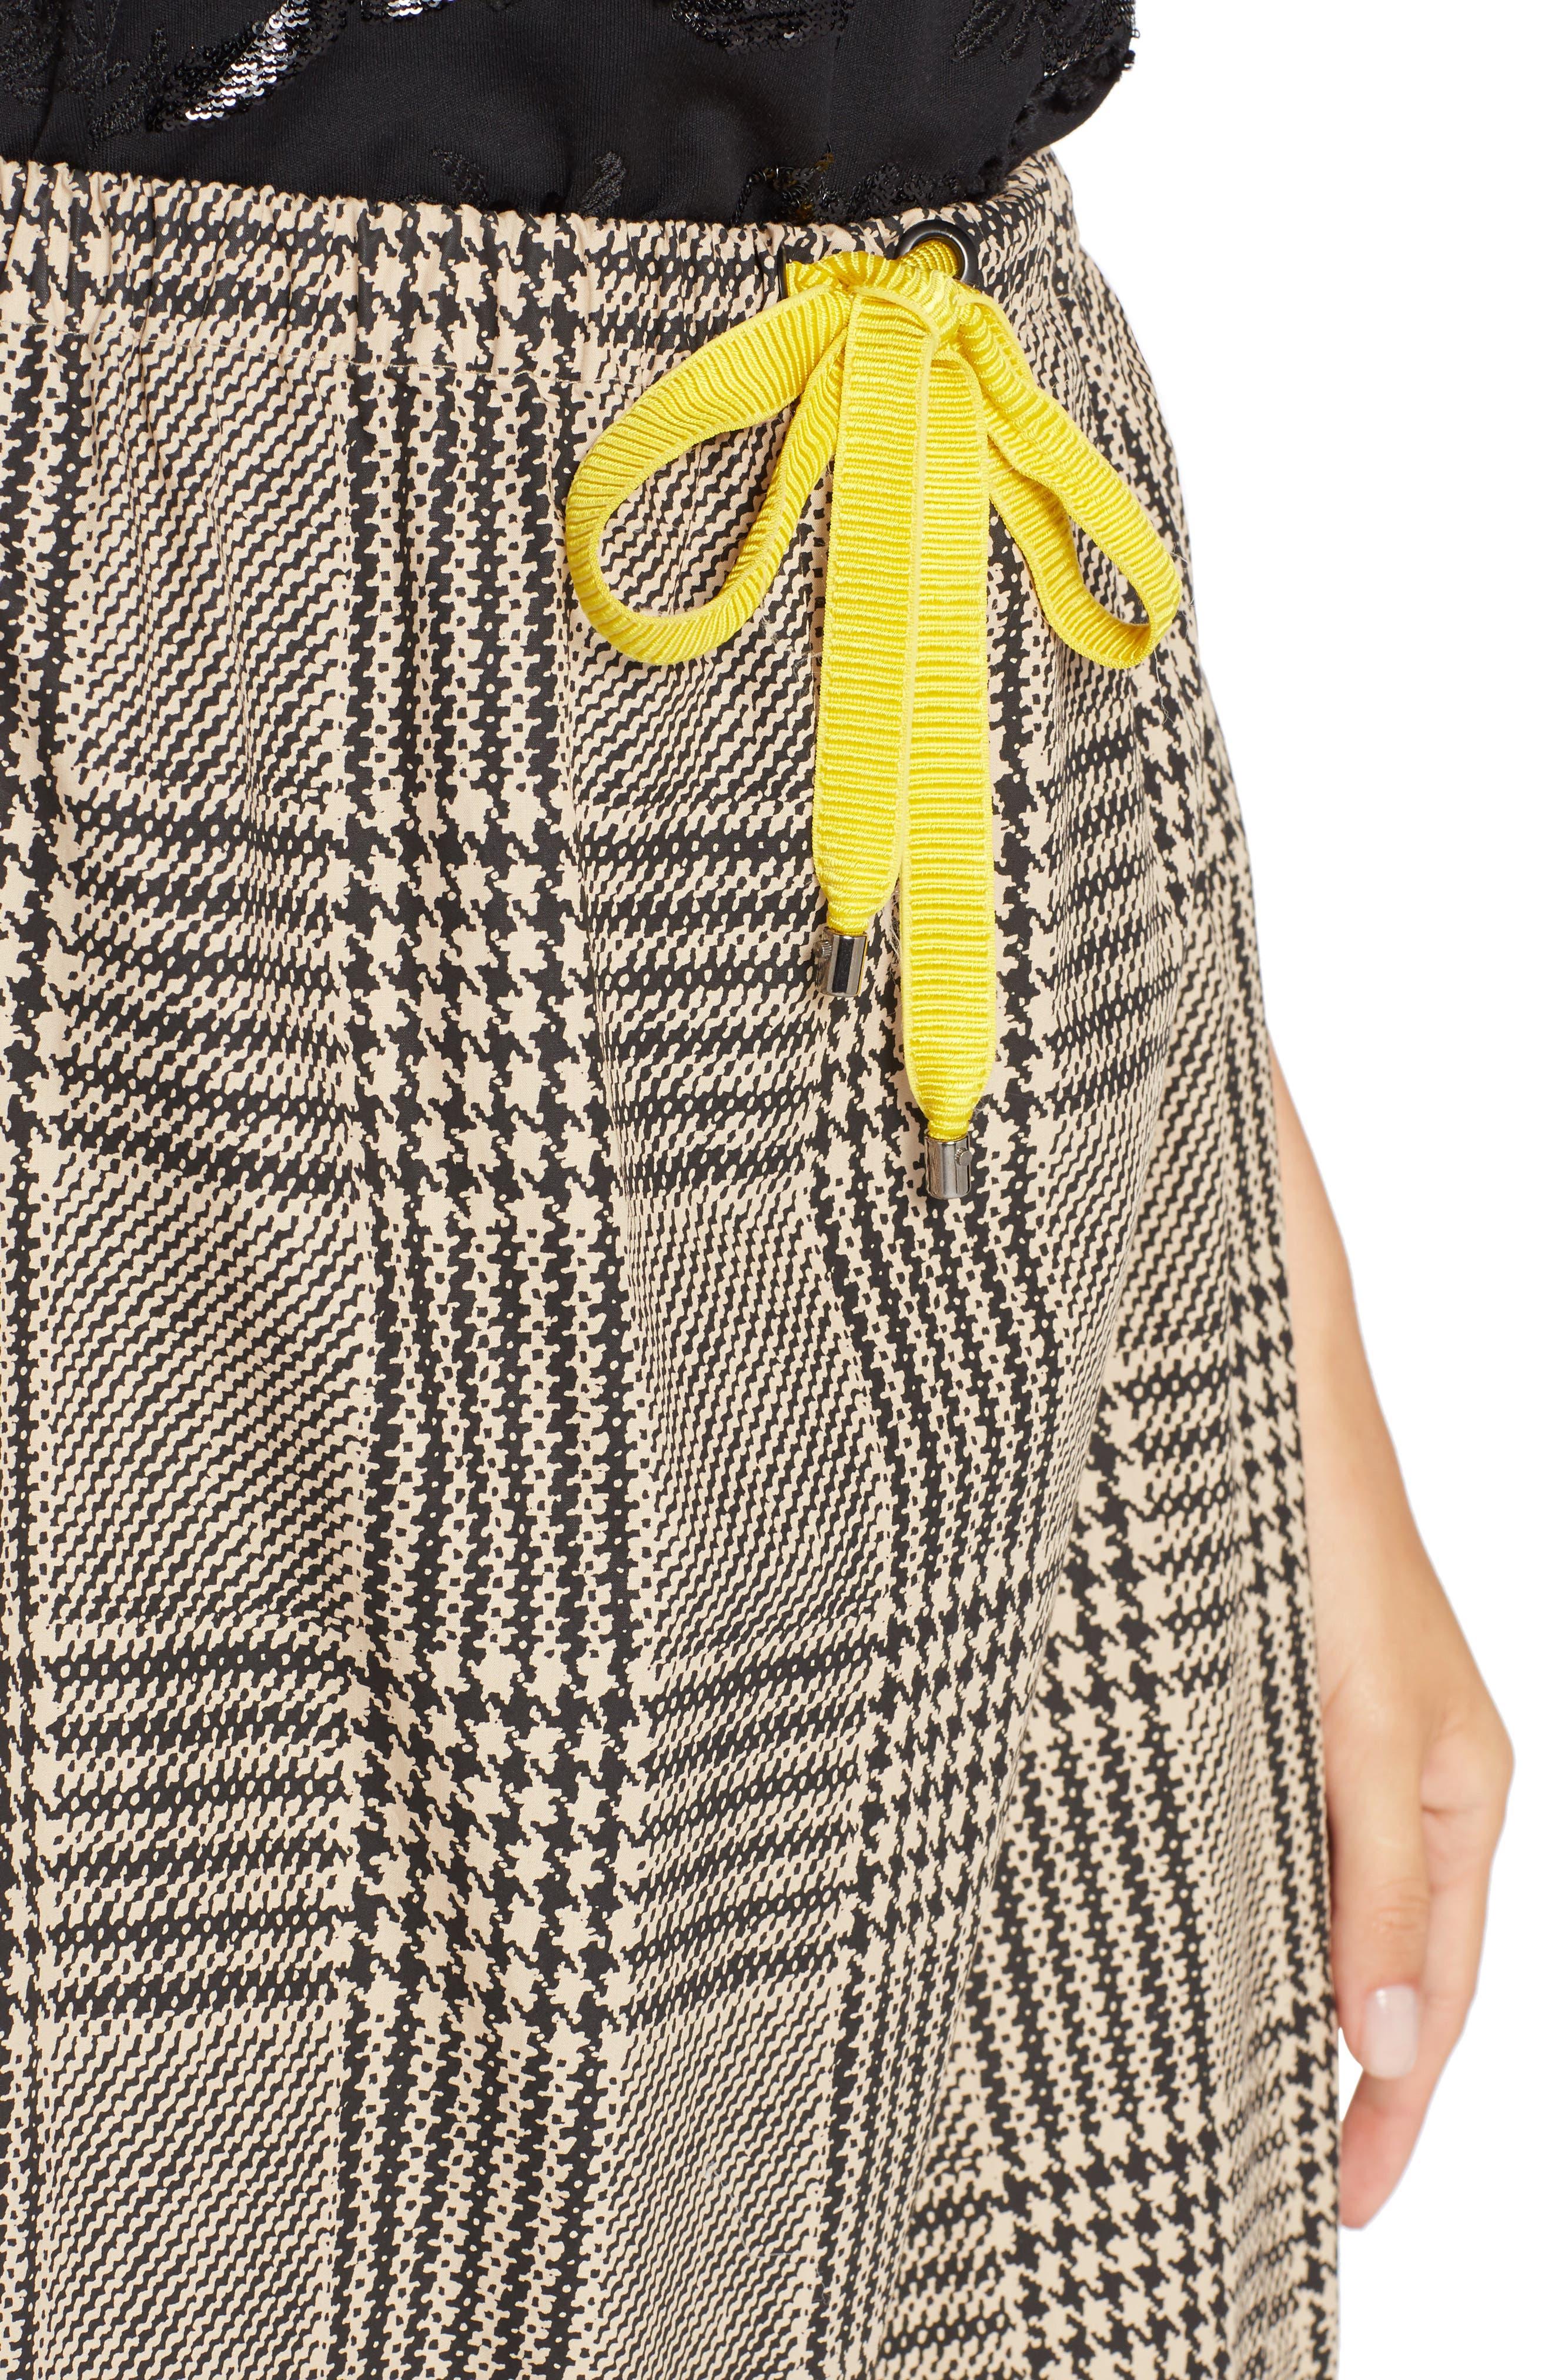 Prince of Wales Ruffle Midi Skirt,                             Alternate thumbnail 4, color,                             001